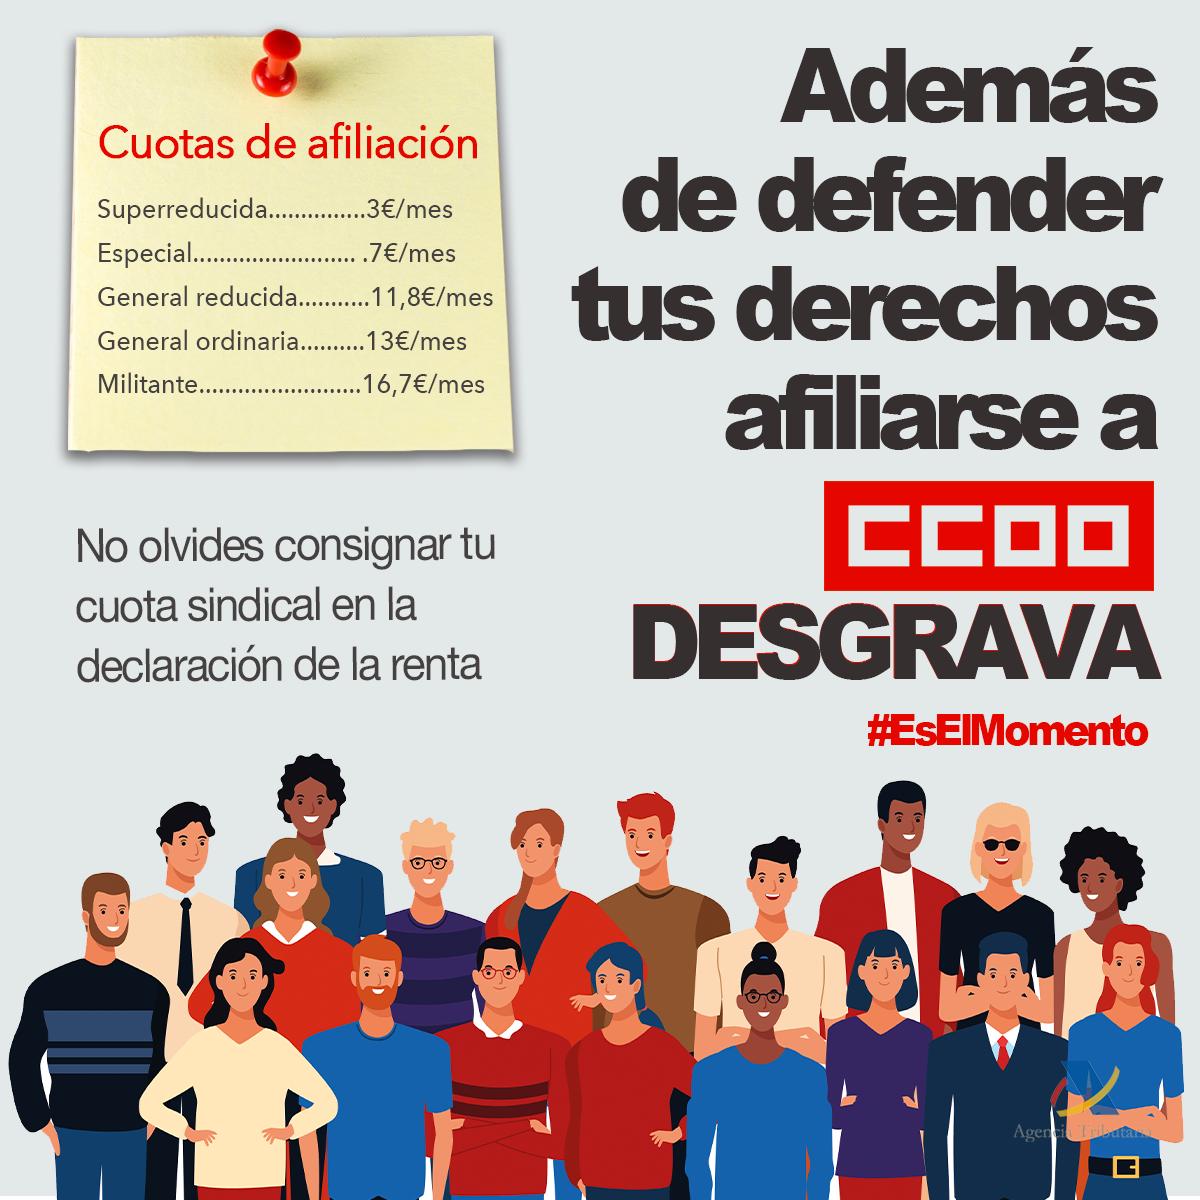 https://www.ccoo.es/3b1127bd0873764733c158539f556b60000001.png